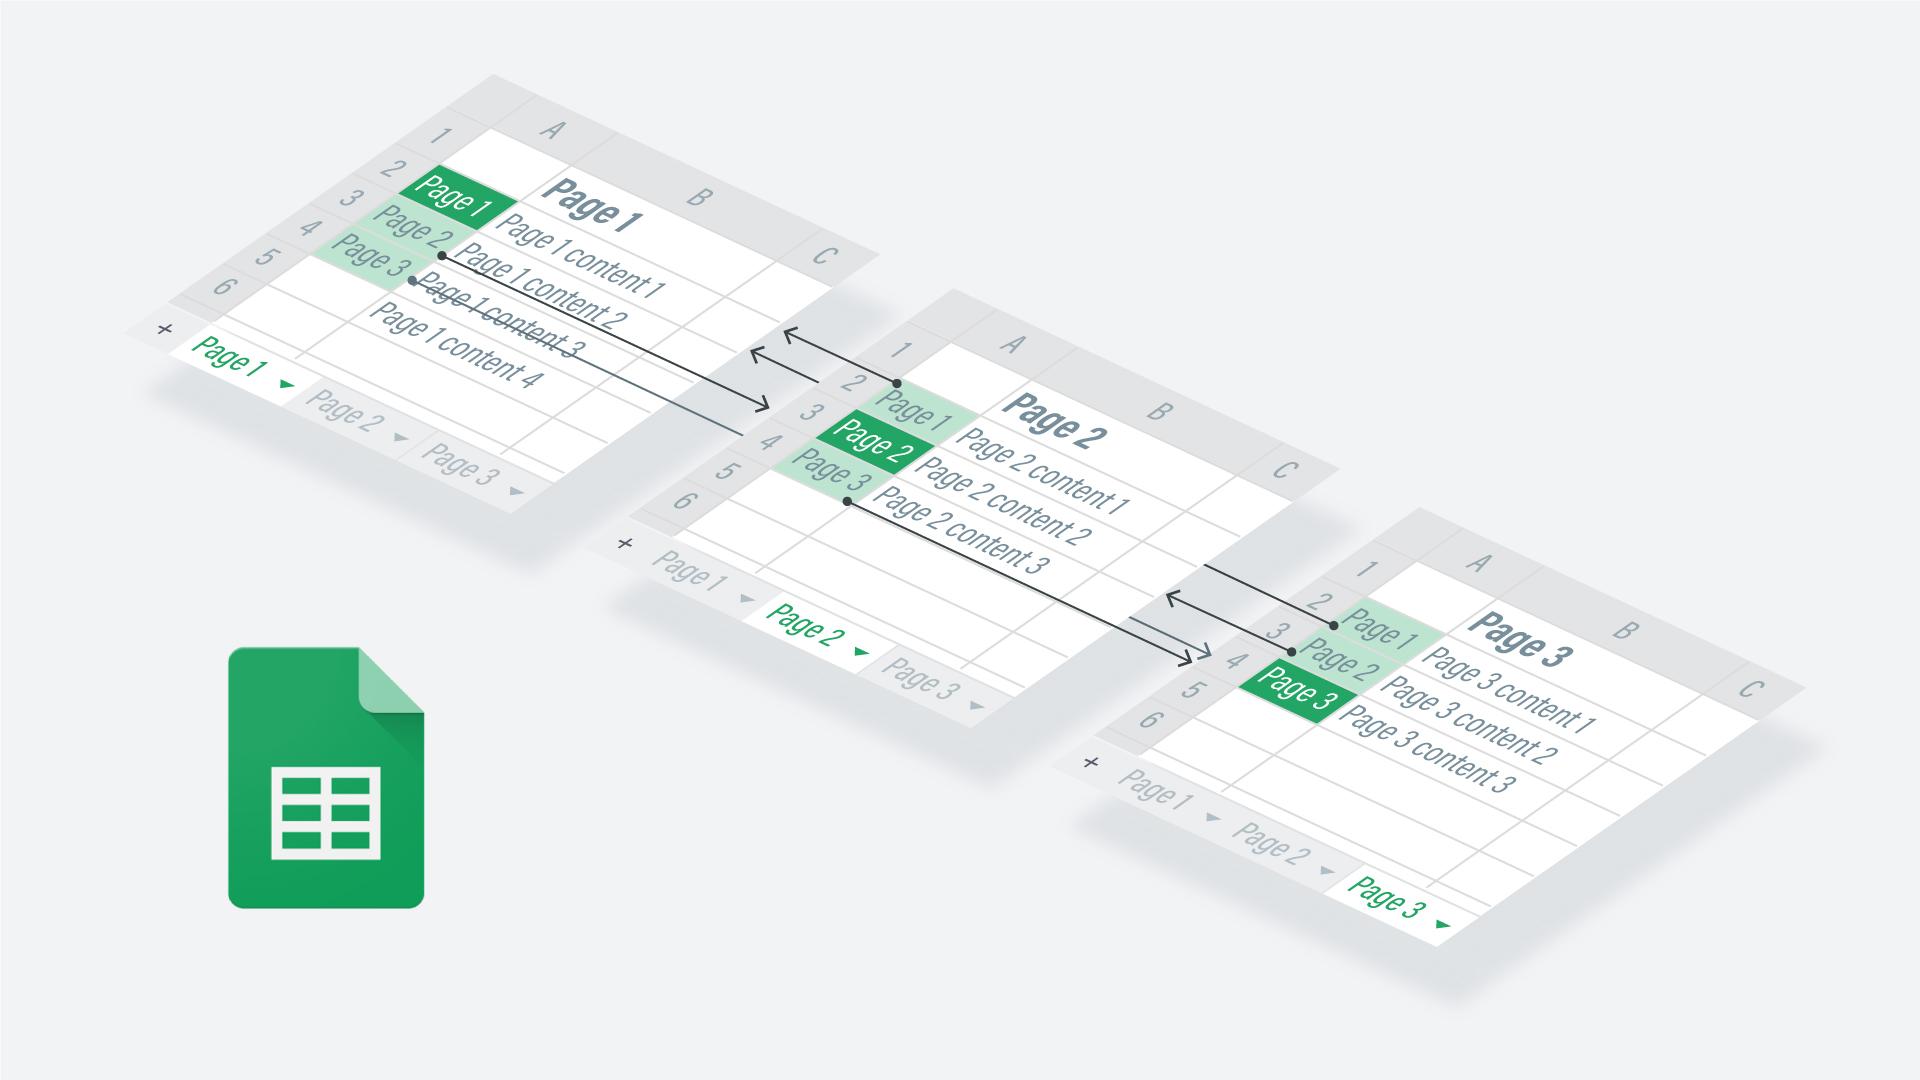 A conceptual diagram of Google Sheets prototype